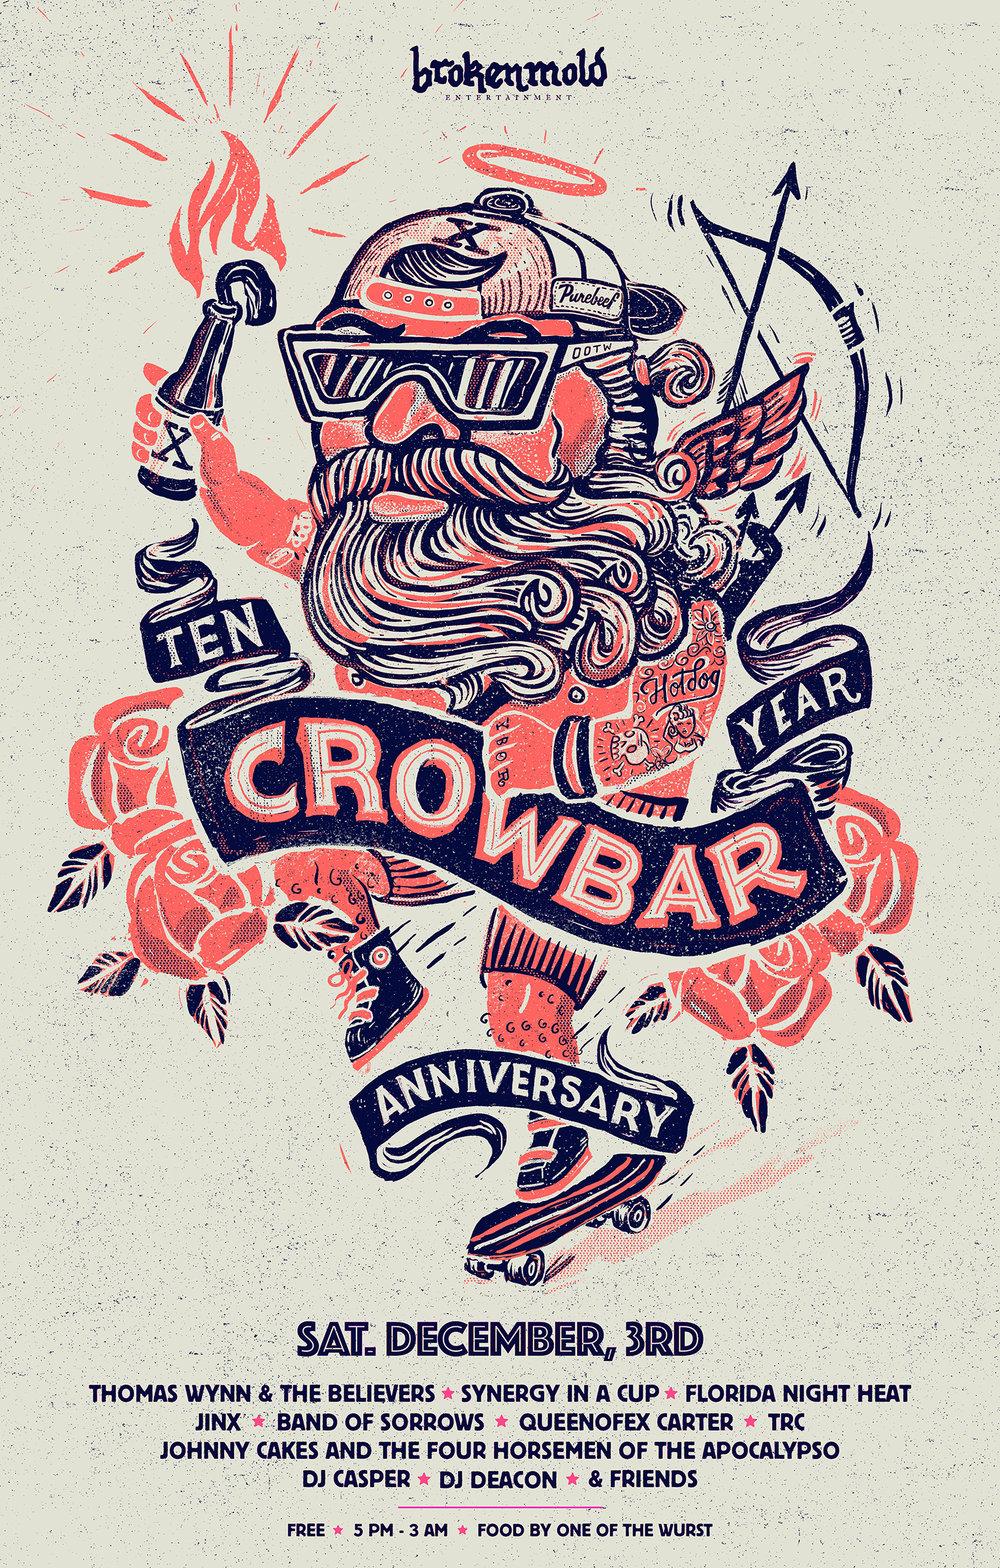 CROWBAR 10 YEAR 11-14-16 web.jpg